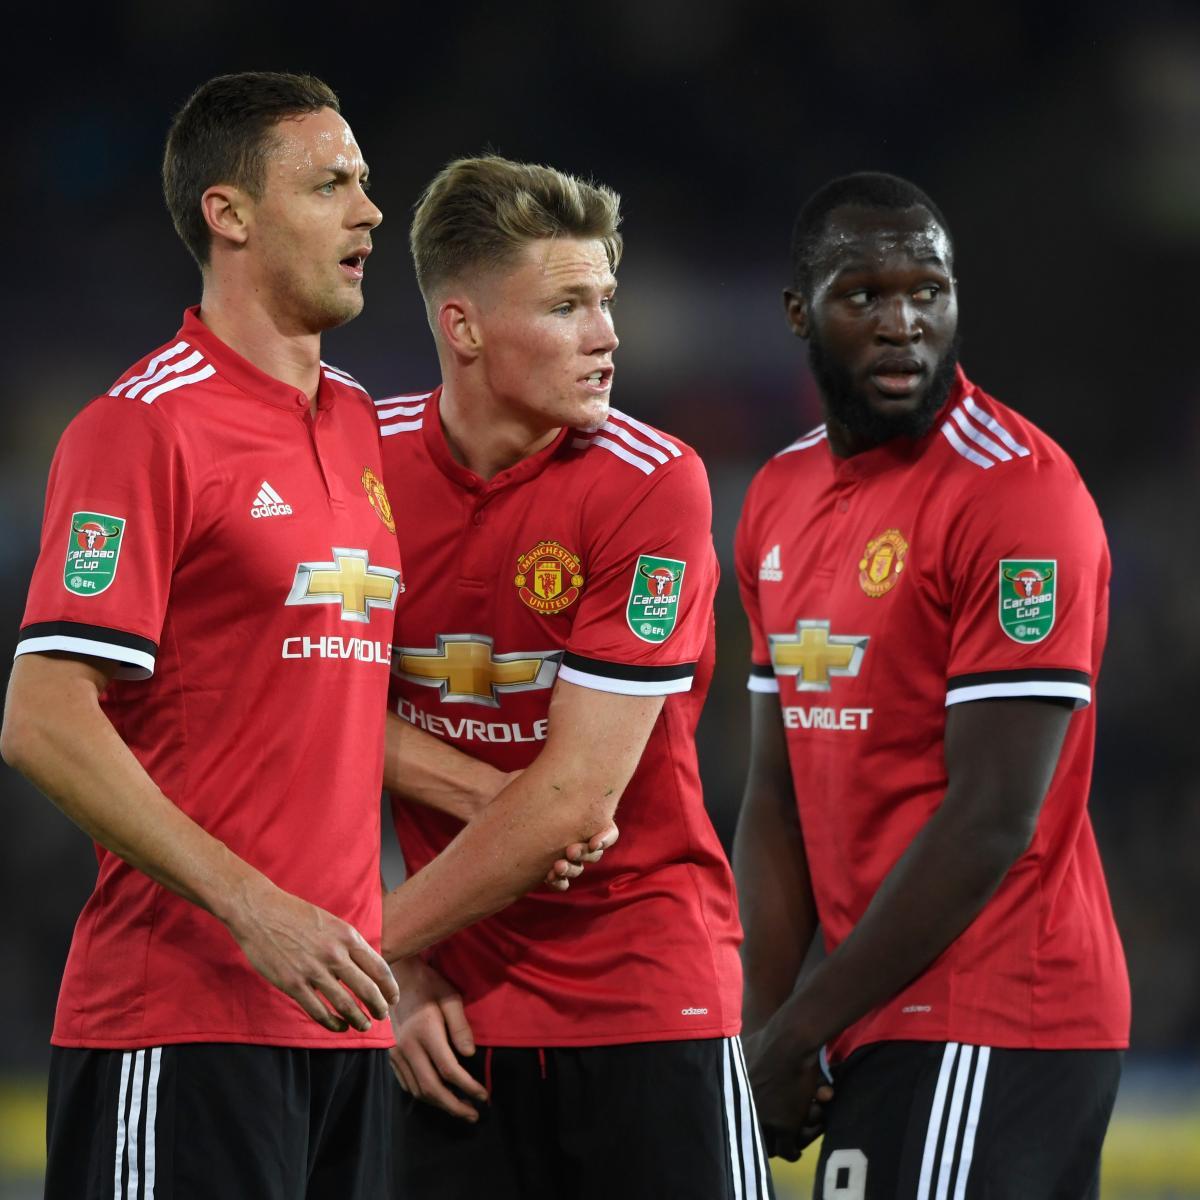 Manchester United 3 1 Huddersfield Result: Manchester United Vs. Tottenham: Team News, Preview, Live